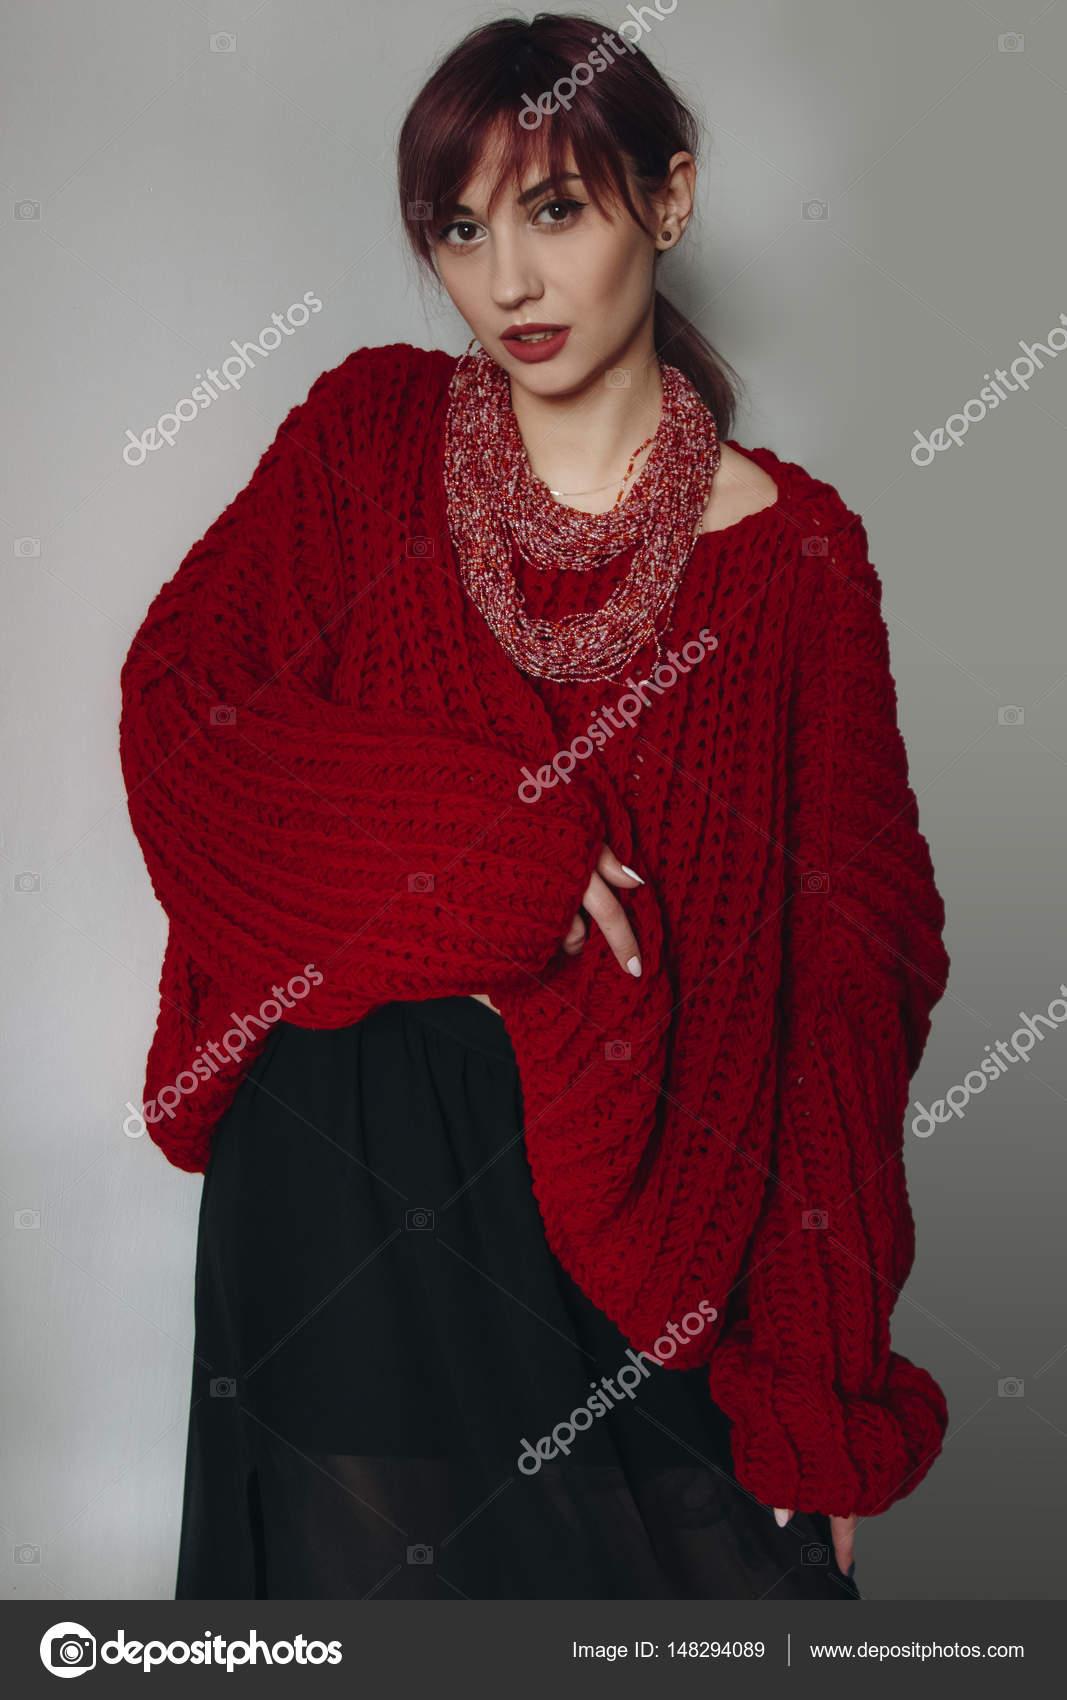 Oversized Trui Rood.Jonge Vrouw In Het Rood Oversized Trui En Zwarte Rok Stockfoto